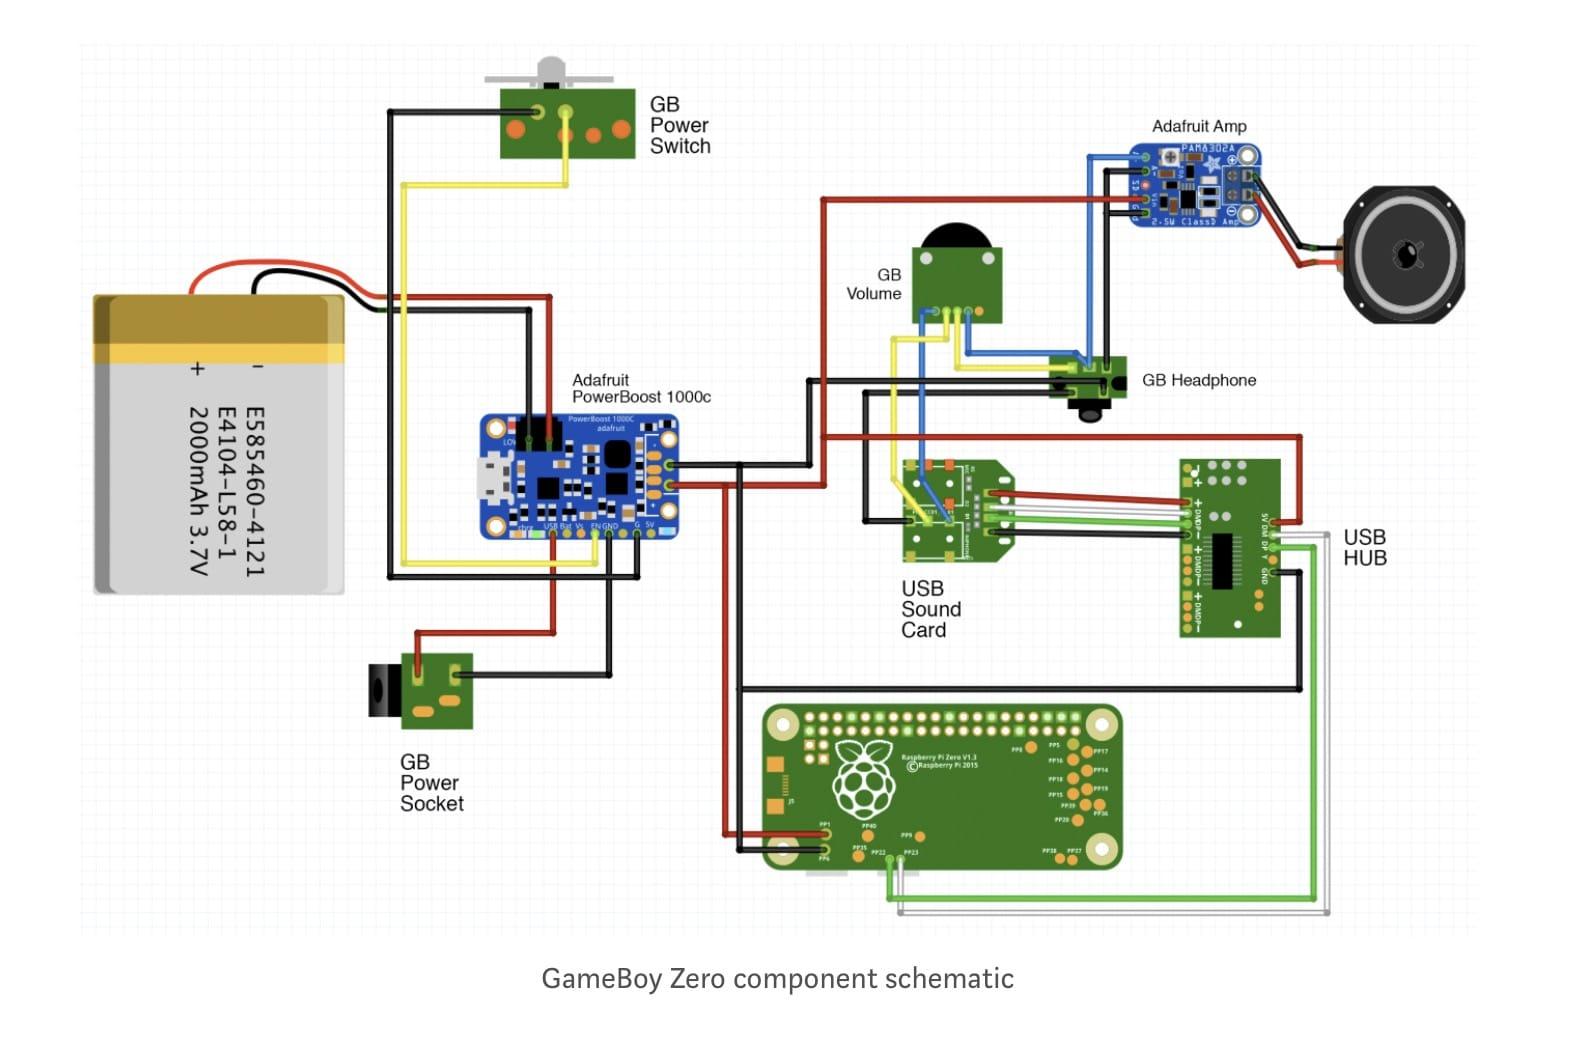 DIY Raspberry Pi RetroPie game controller handheld - Geeky Gadgets on controller battery, controller cable, controller computer diagram, controller accessories, controller cabinet,